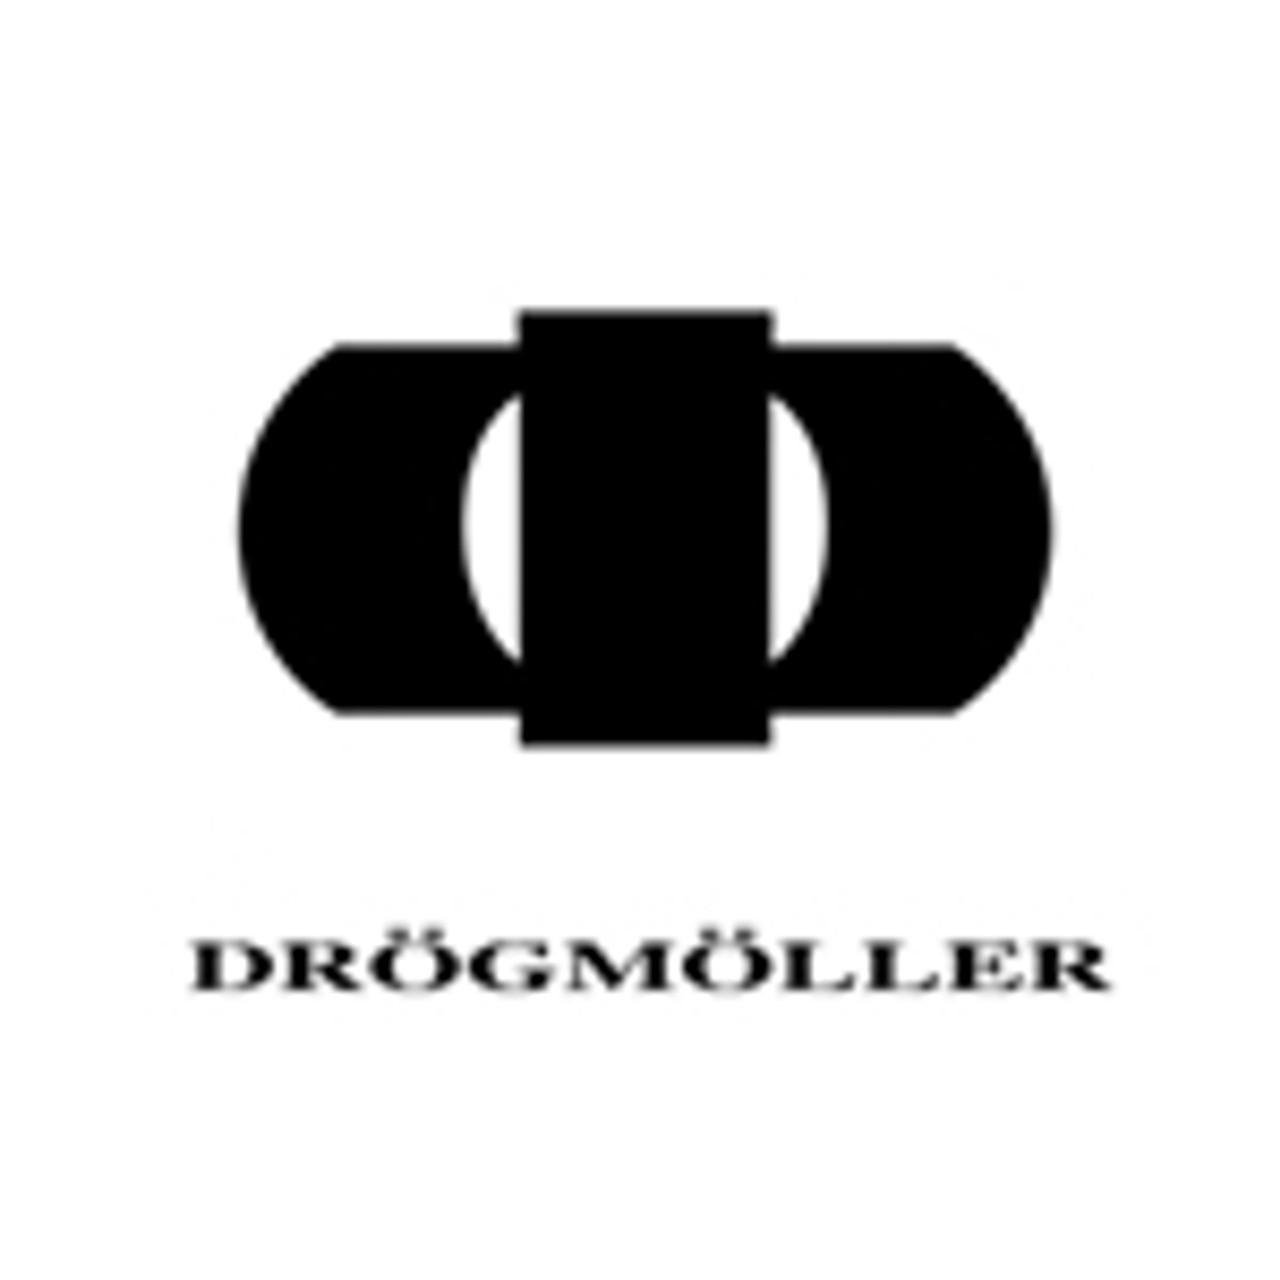 Drogmoller